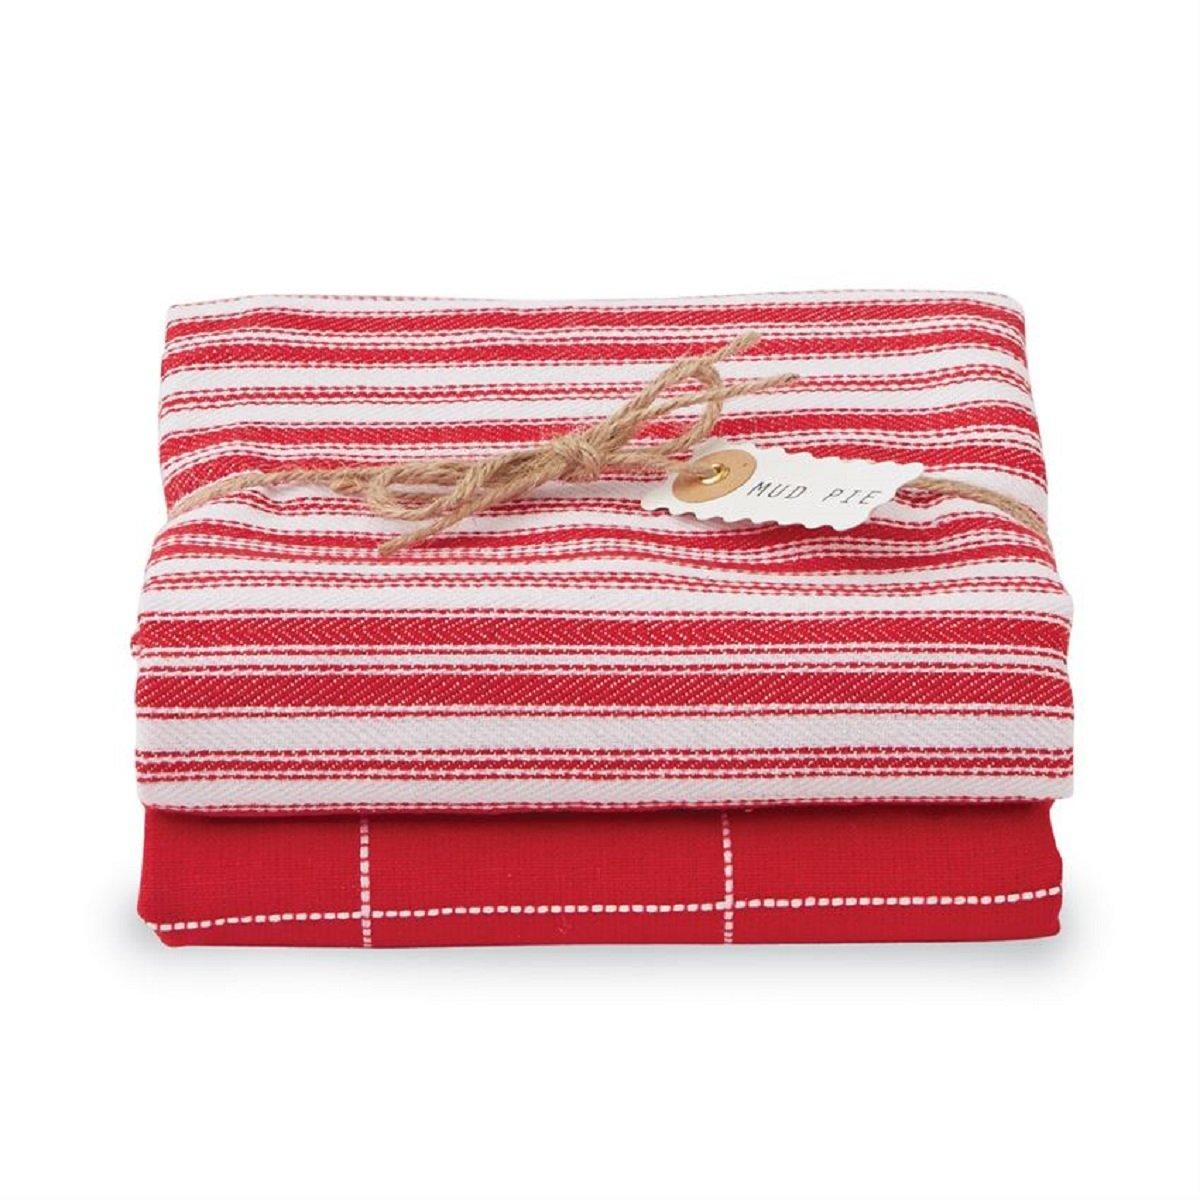 Mud Pie Linen Dish Towel Set (Red)